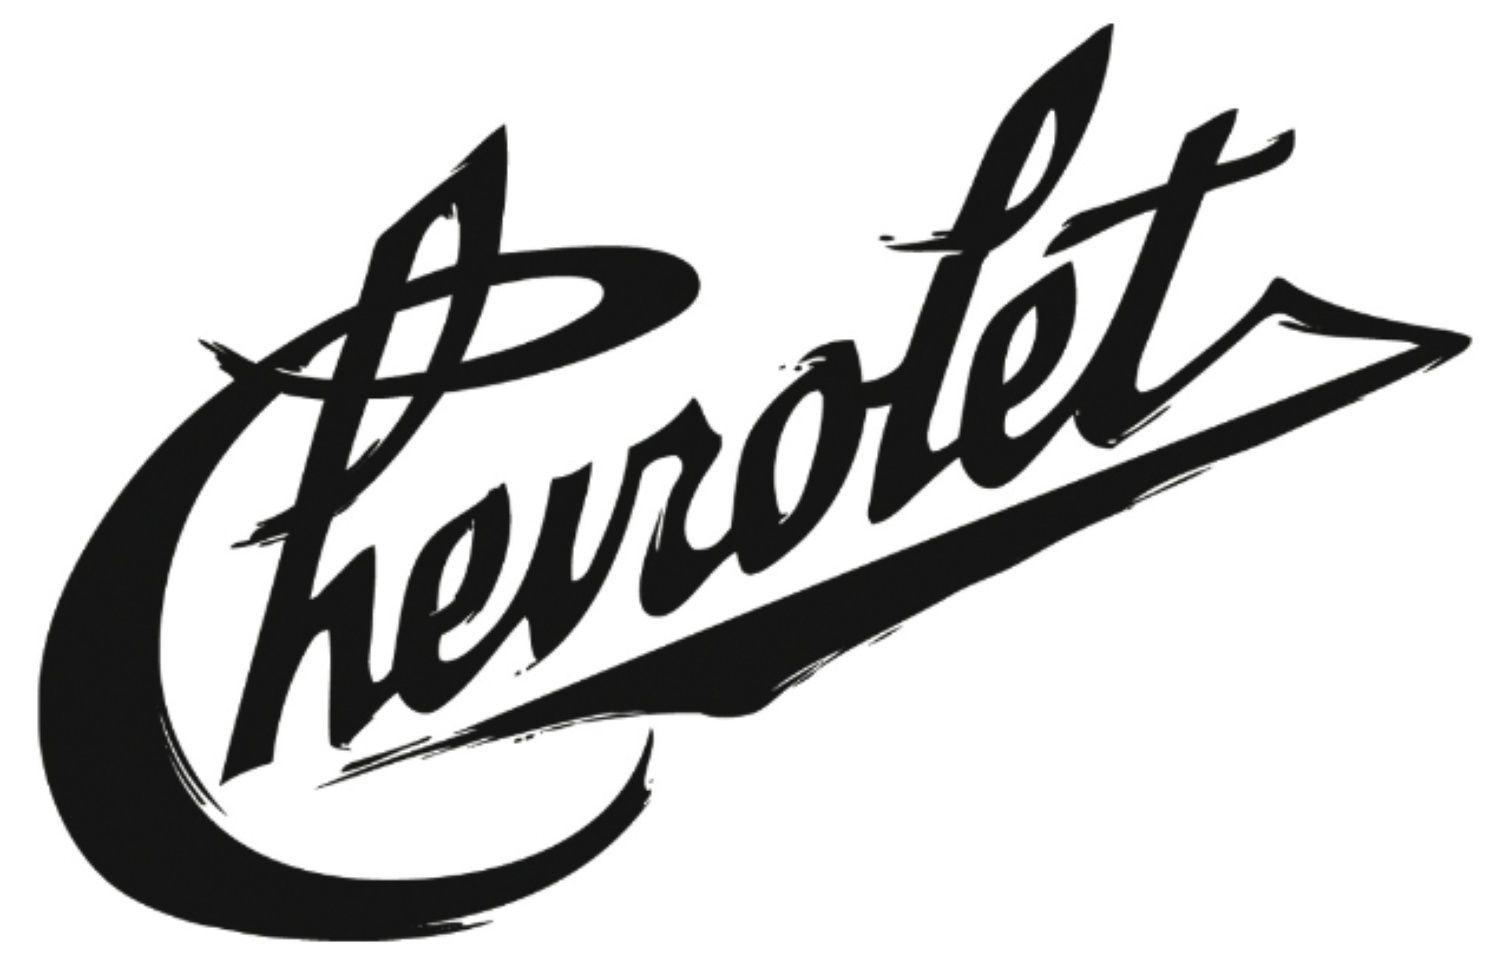 Chevy Chevrolet Graffiti Lettering Symbol Fast Design Vinyl Decal